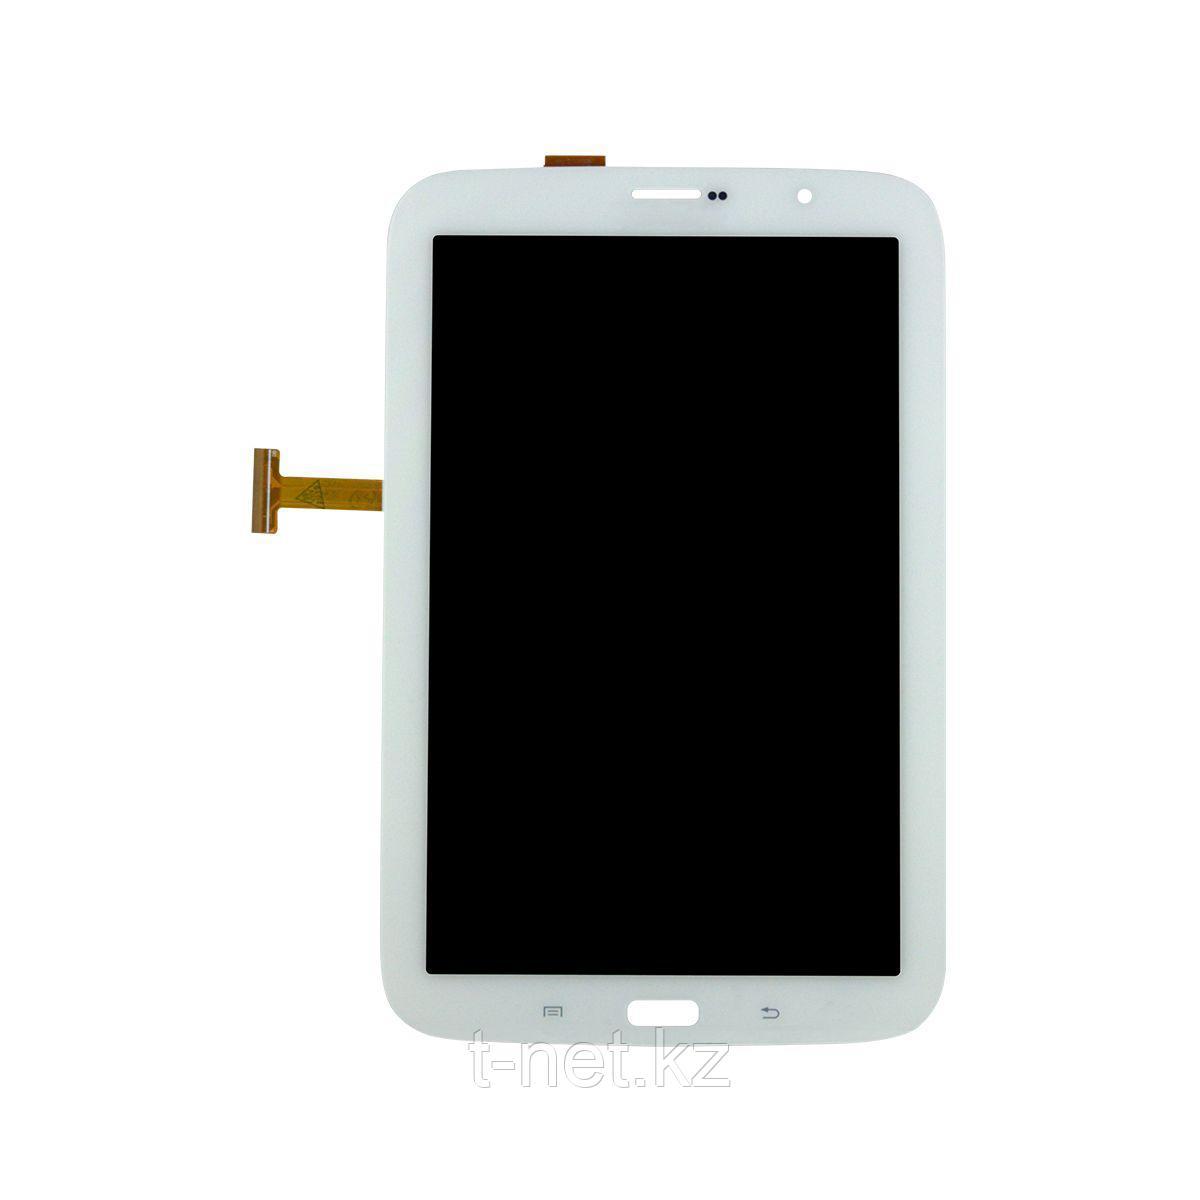 Дисплей Samsung Galaxy Note 8.0 N5100, с сенсором, цвет белый